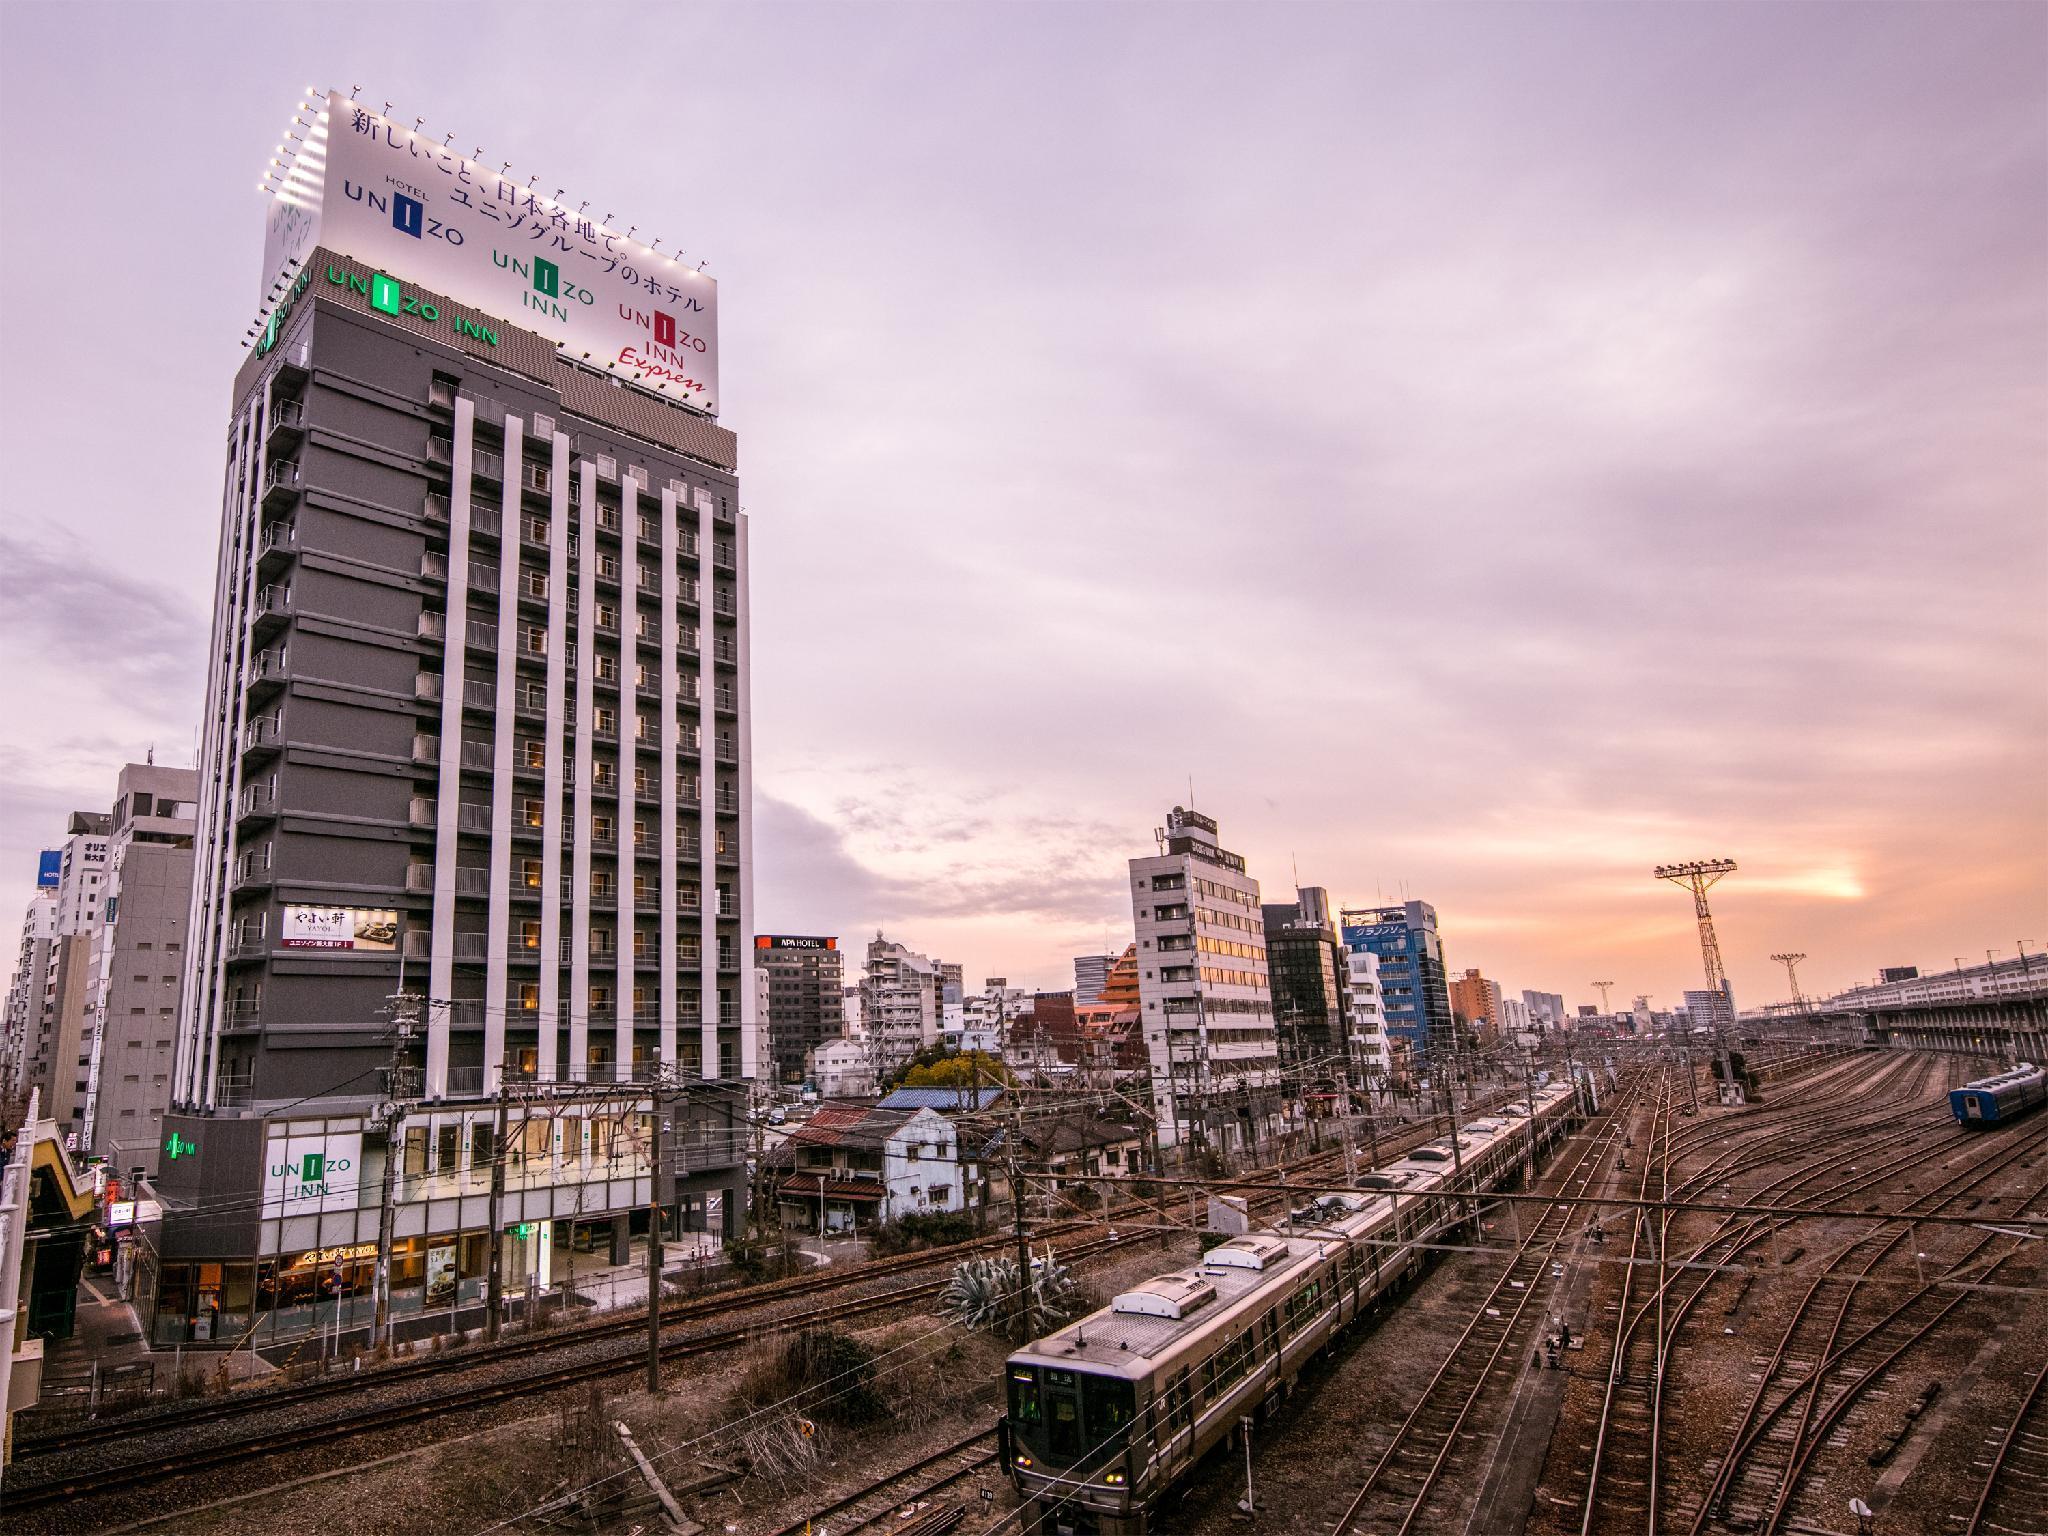 新大阪無限酒店 Infinity Hotel shinosaka